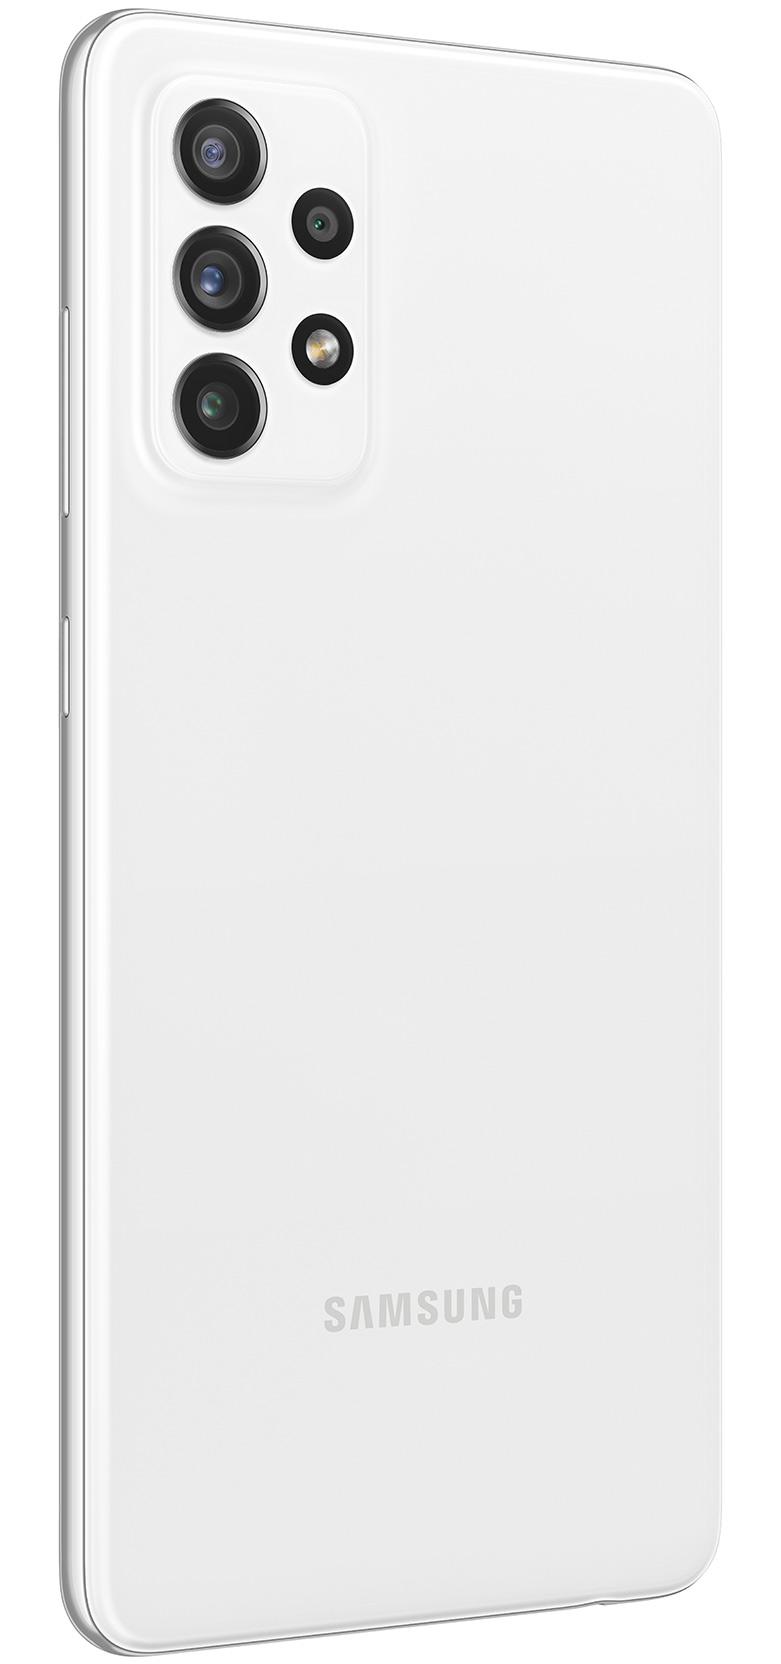 Samsung Galaxy A72 DS (SM-A725) 256GB White - 4